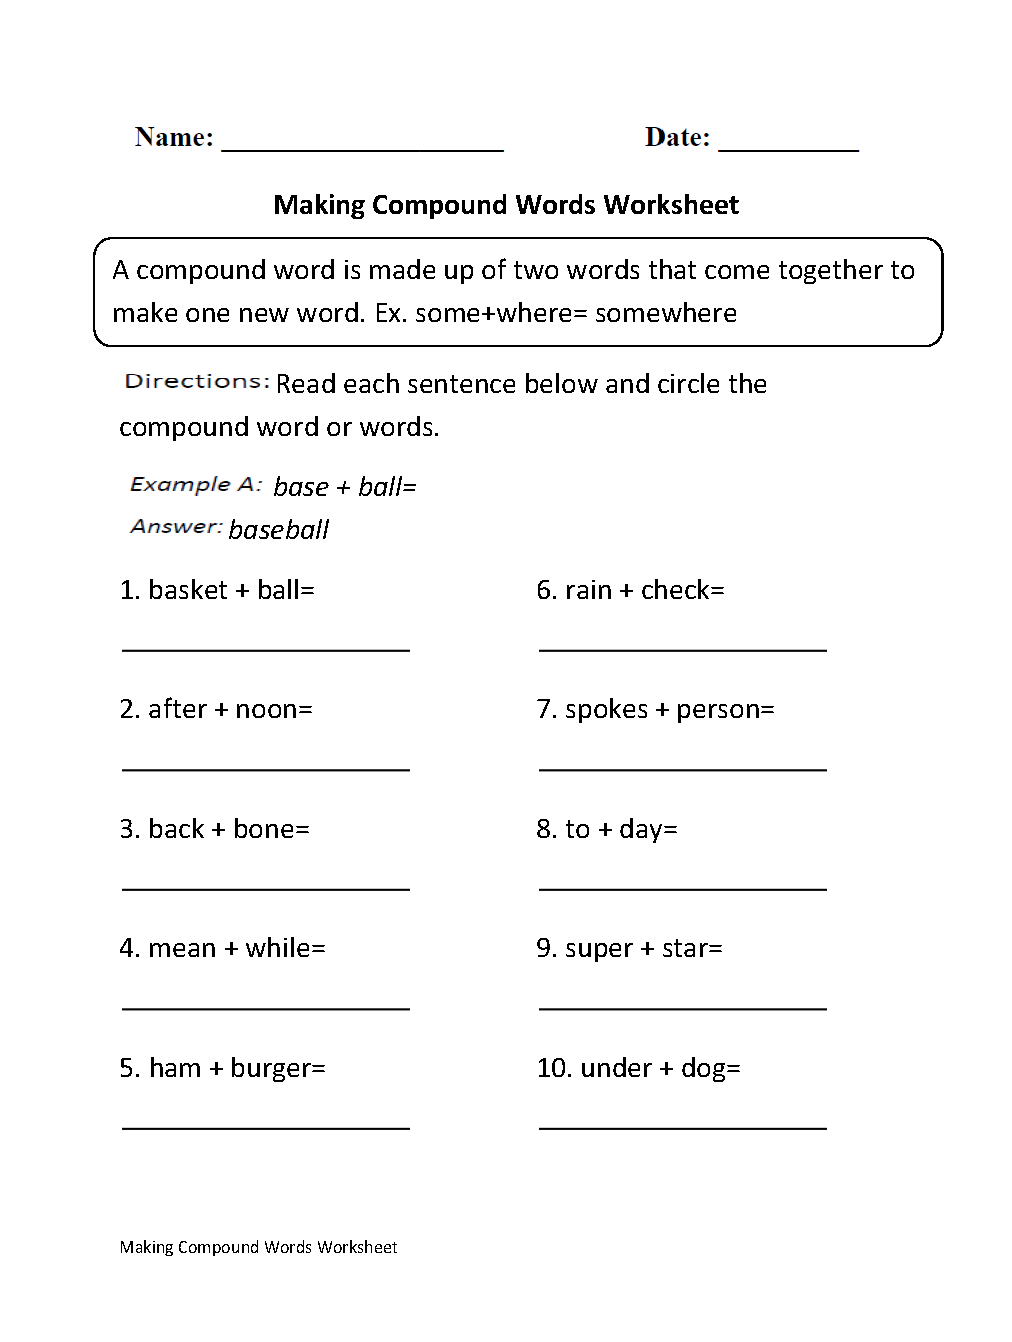 Making Compound Words Worksheet   Compound words worksheets [ 1342 x 1012 Pixel ]